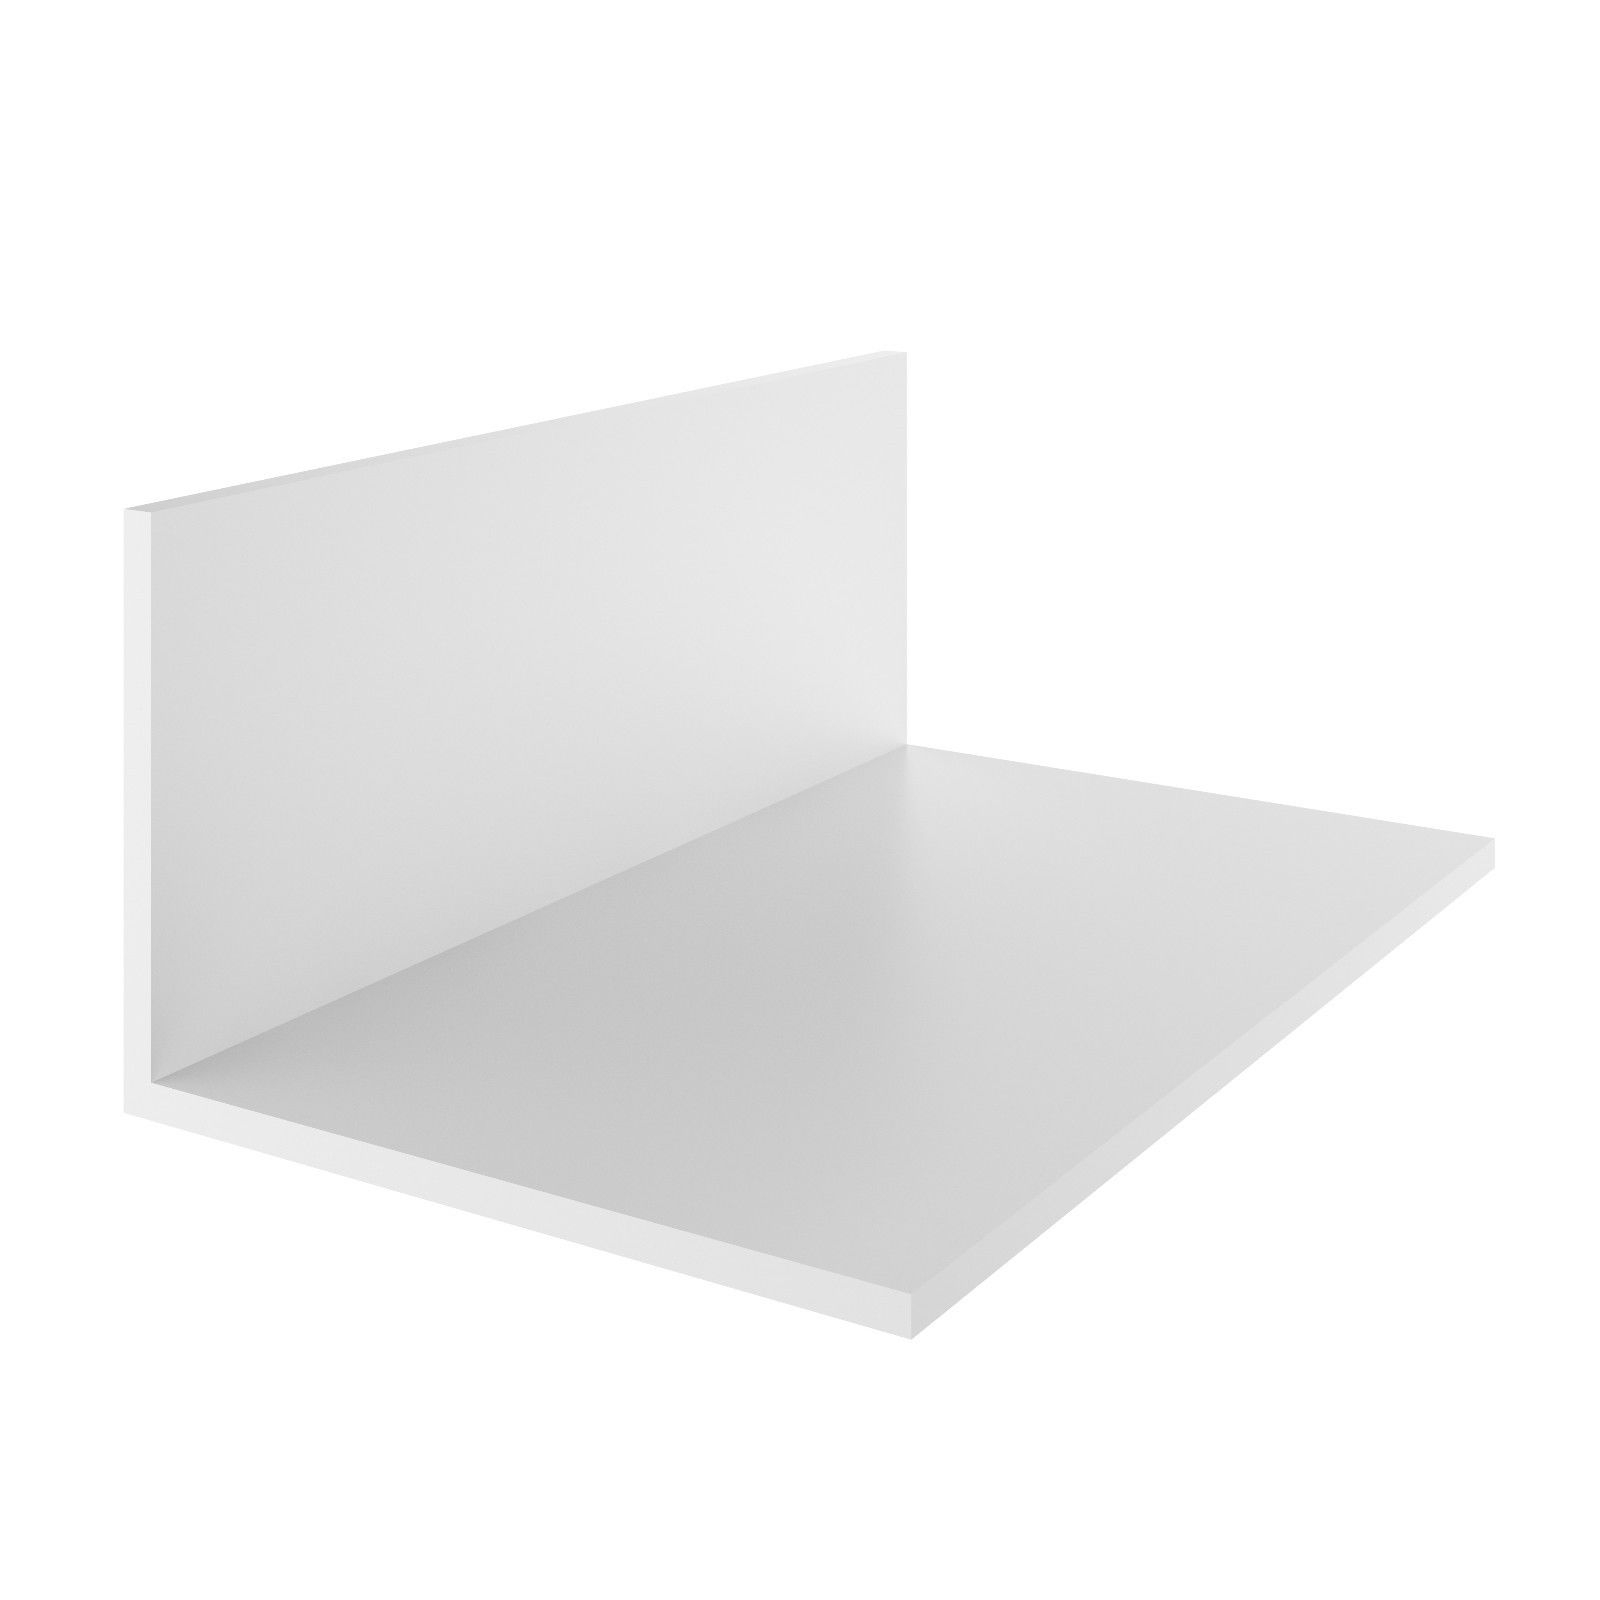 """2,13€/m"" 1,5m Profil Eckleiste Aussenwinkel PVC-Winkel Winkelprofil    40x20 mm"